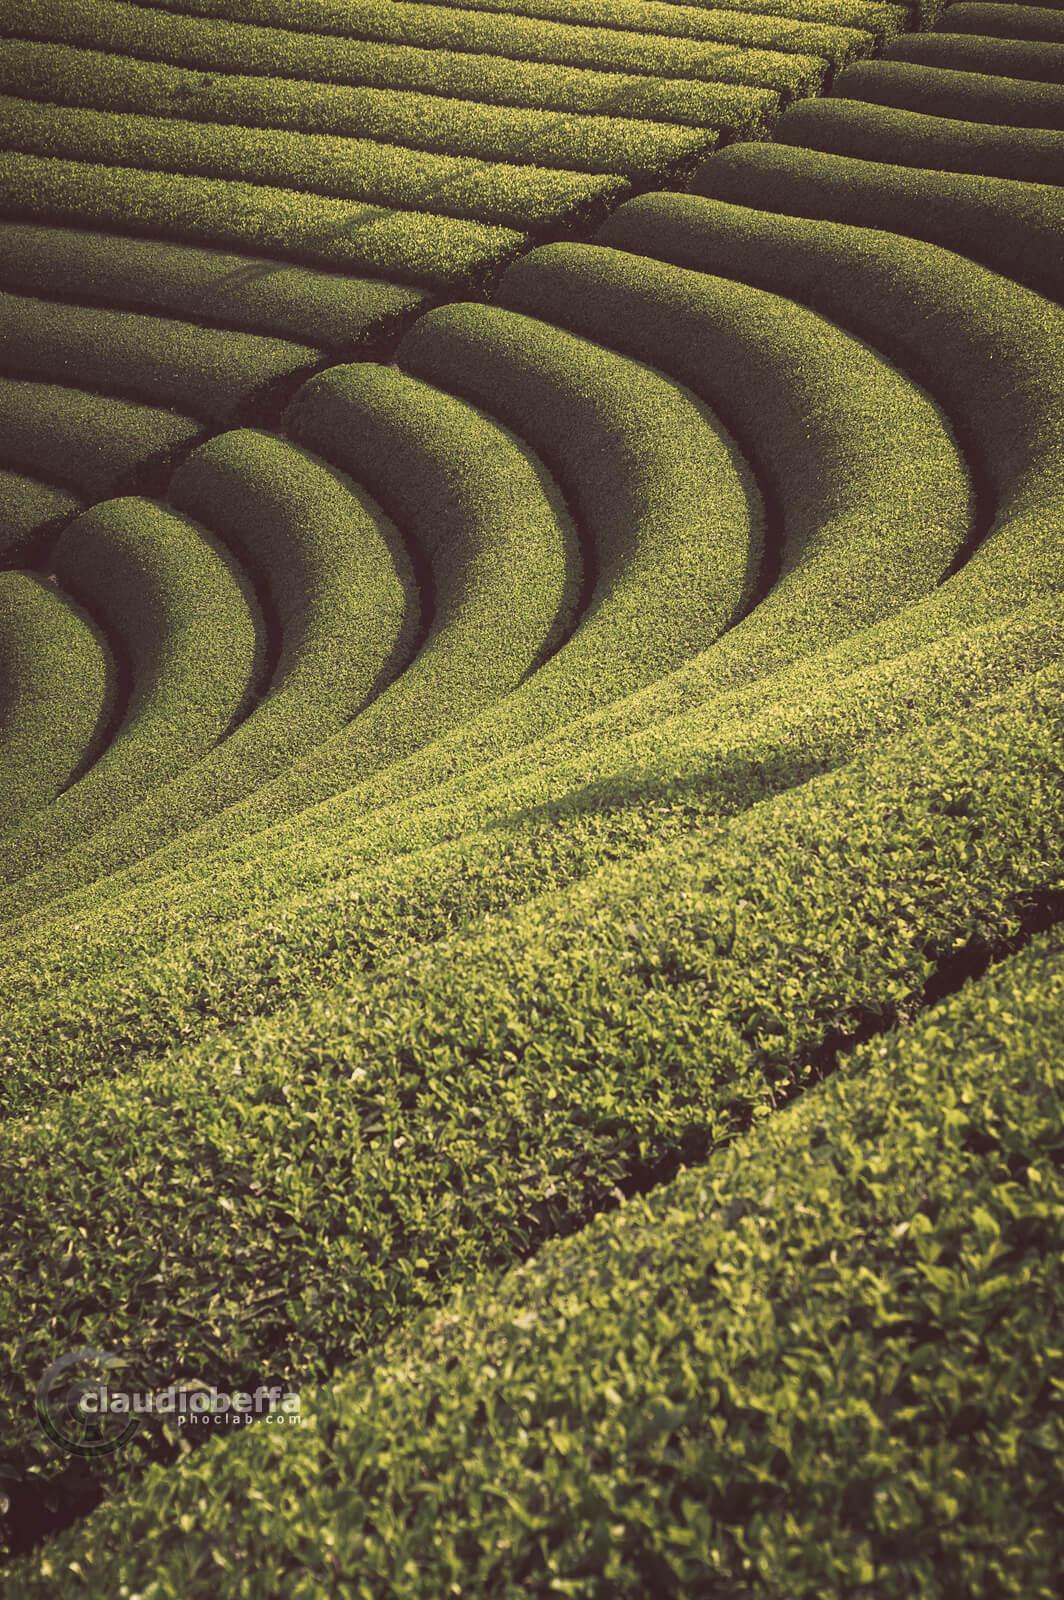 Enkei circular shaped tea field, Wazuka, Japan, Tradition, Travel.